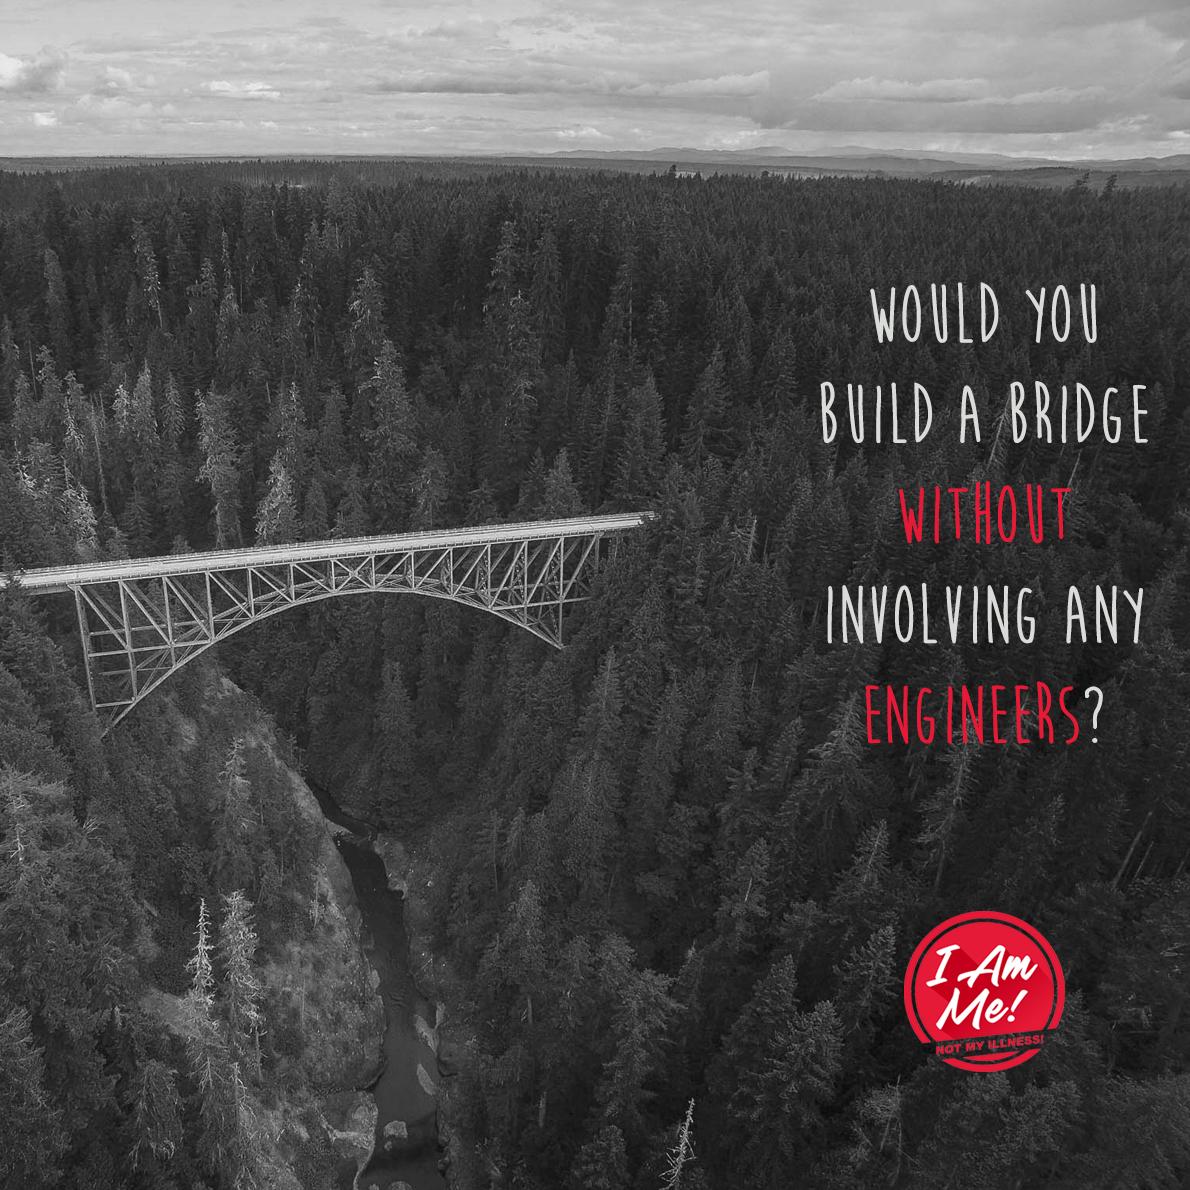 build-a-bridge.jpg